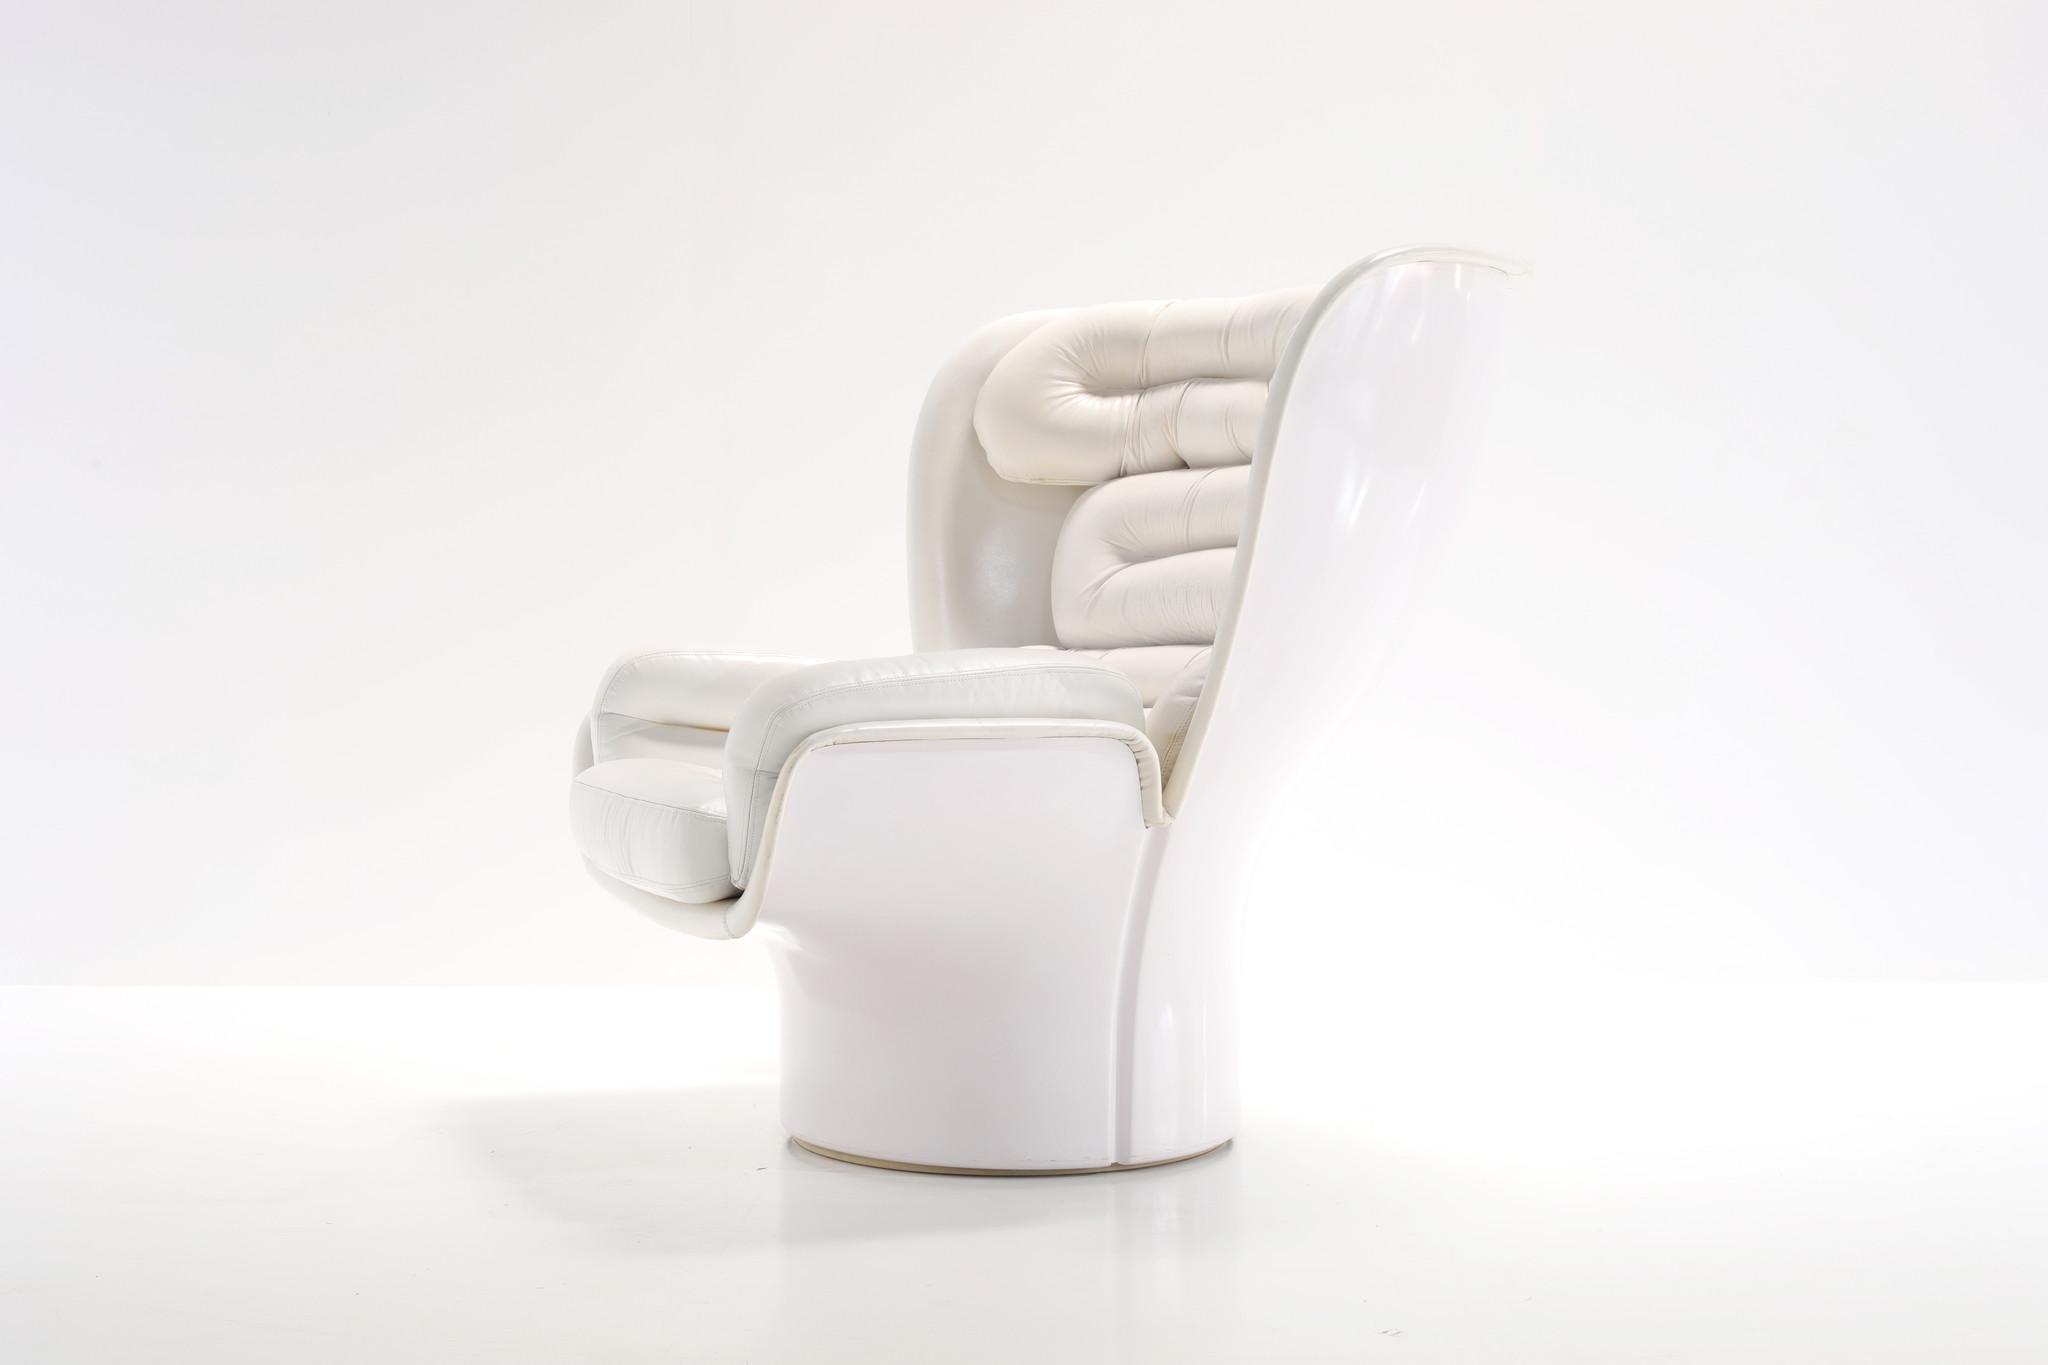 Elda Chair by Joe Colombo for comfort, 1960s